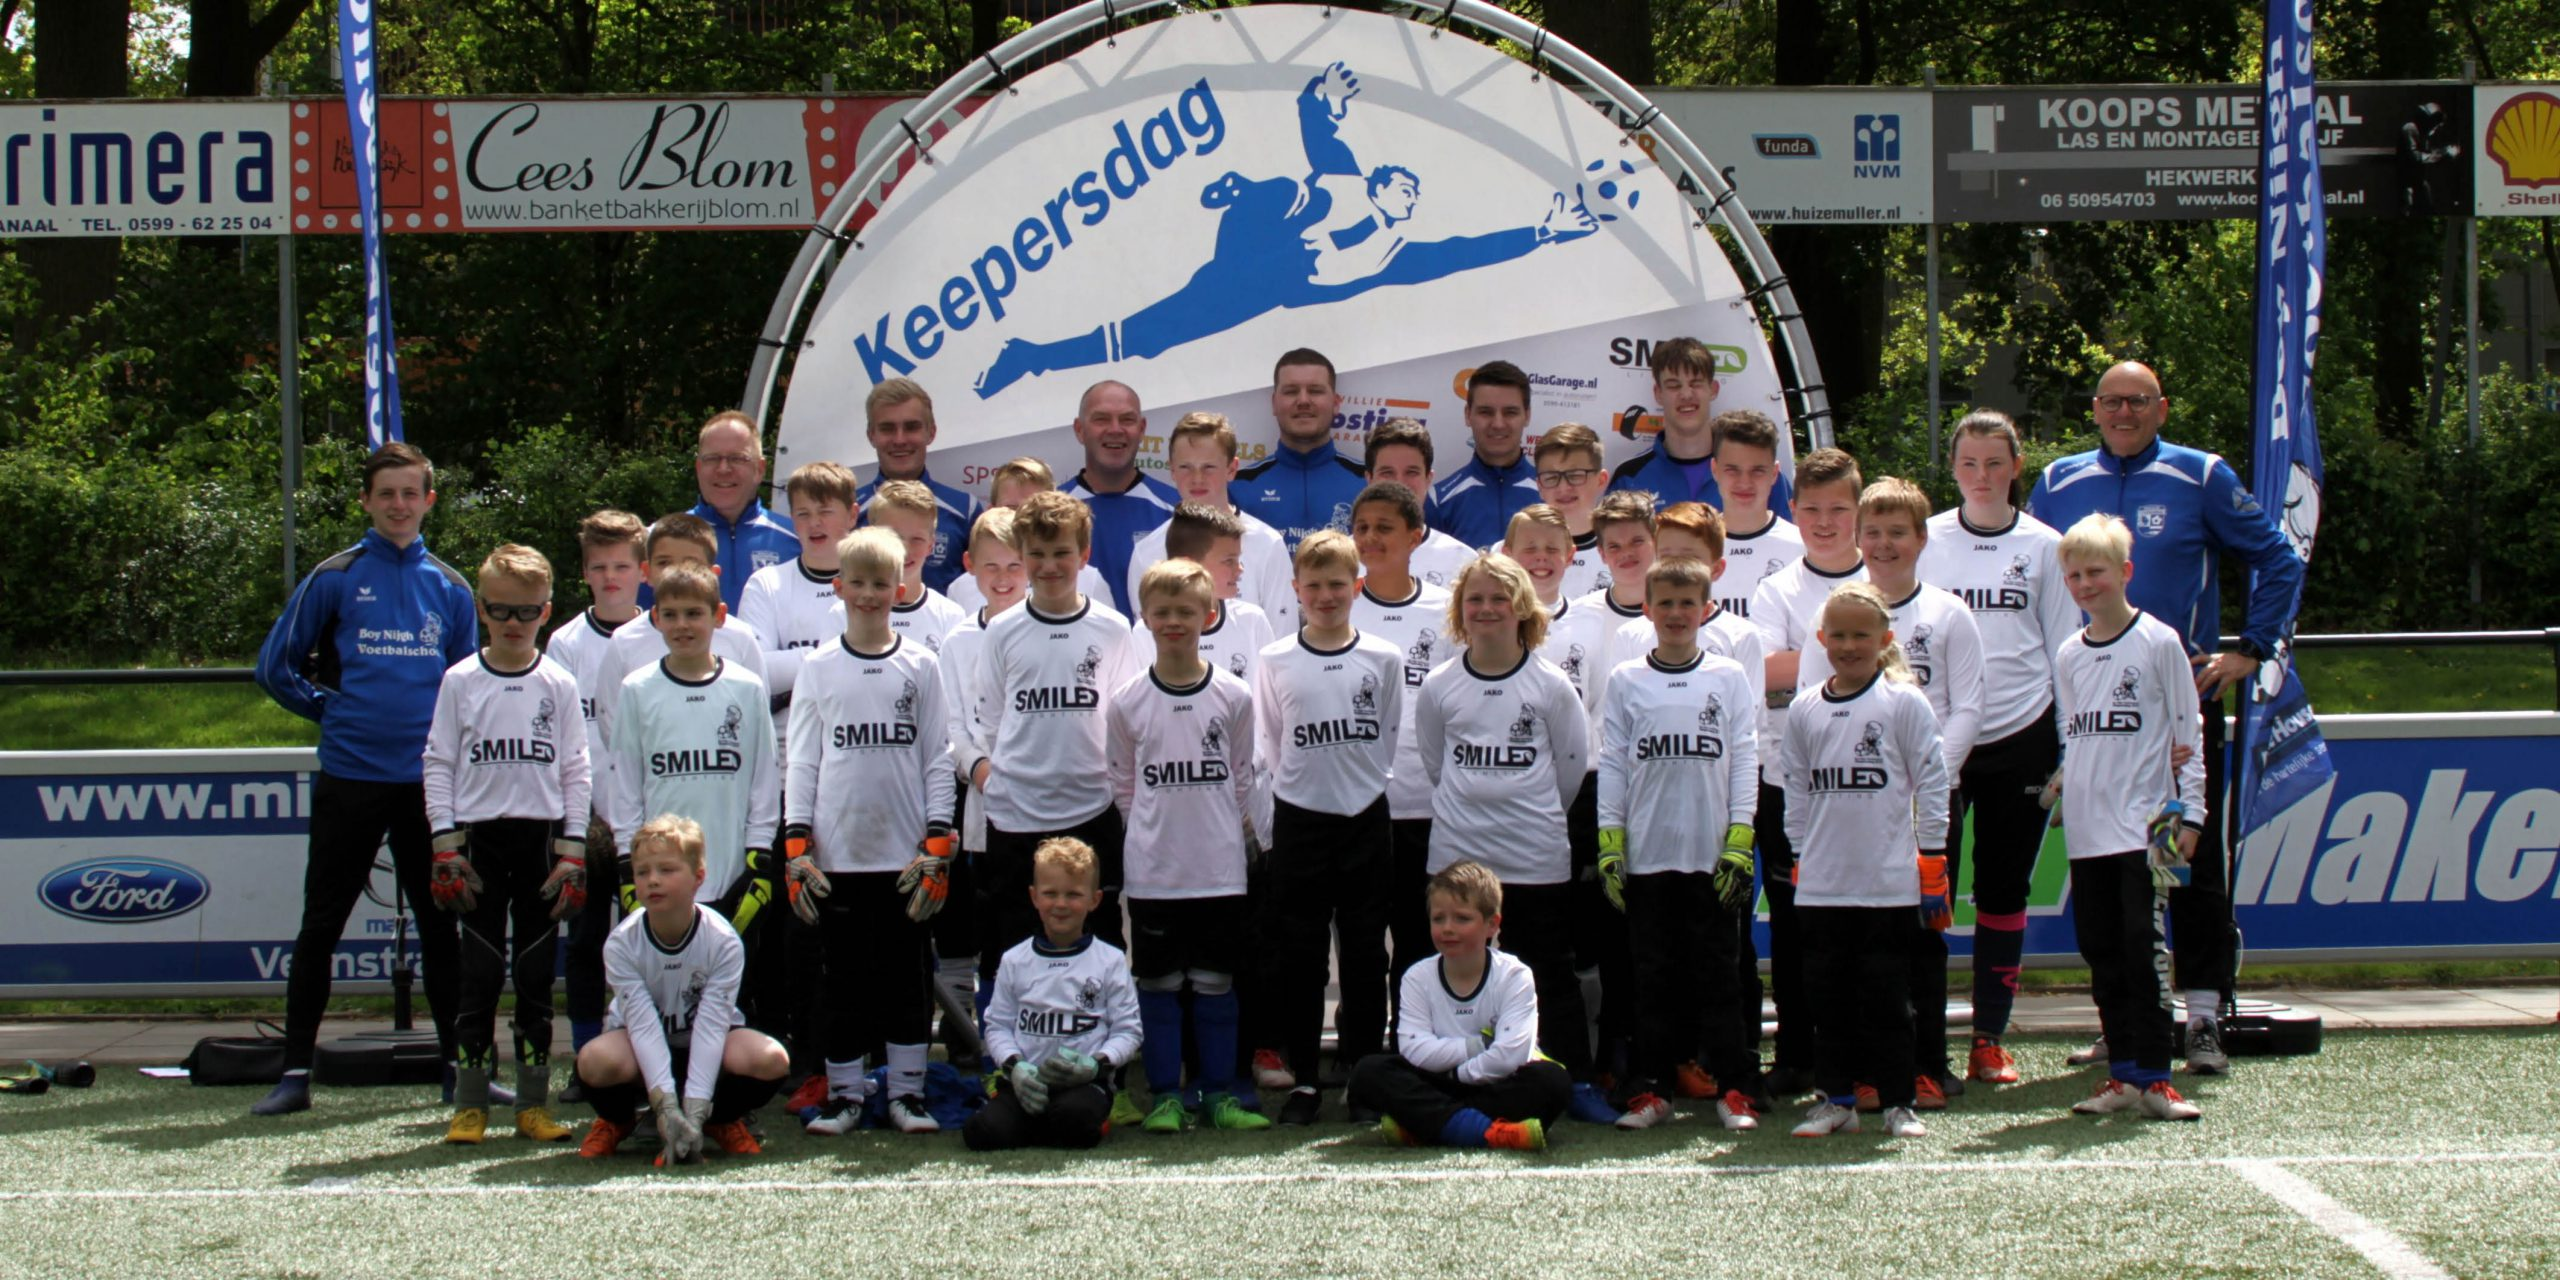 Boy Nijgh voetbalschool sponsoring